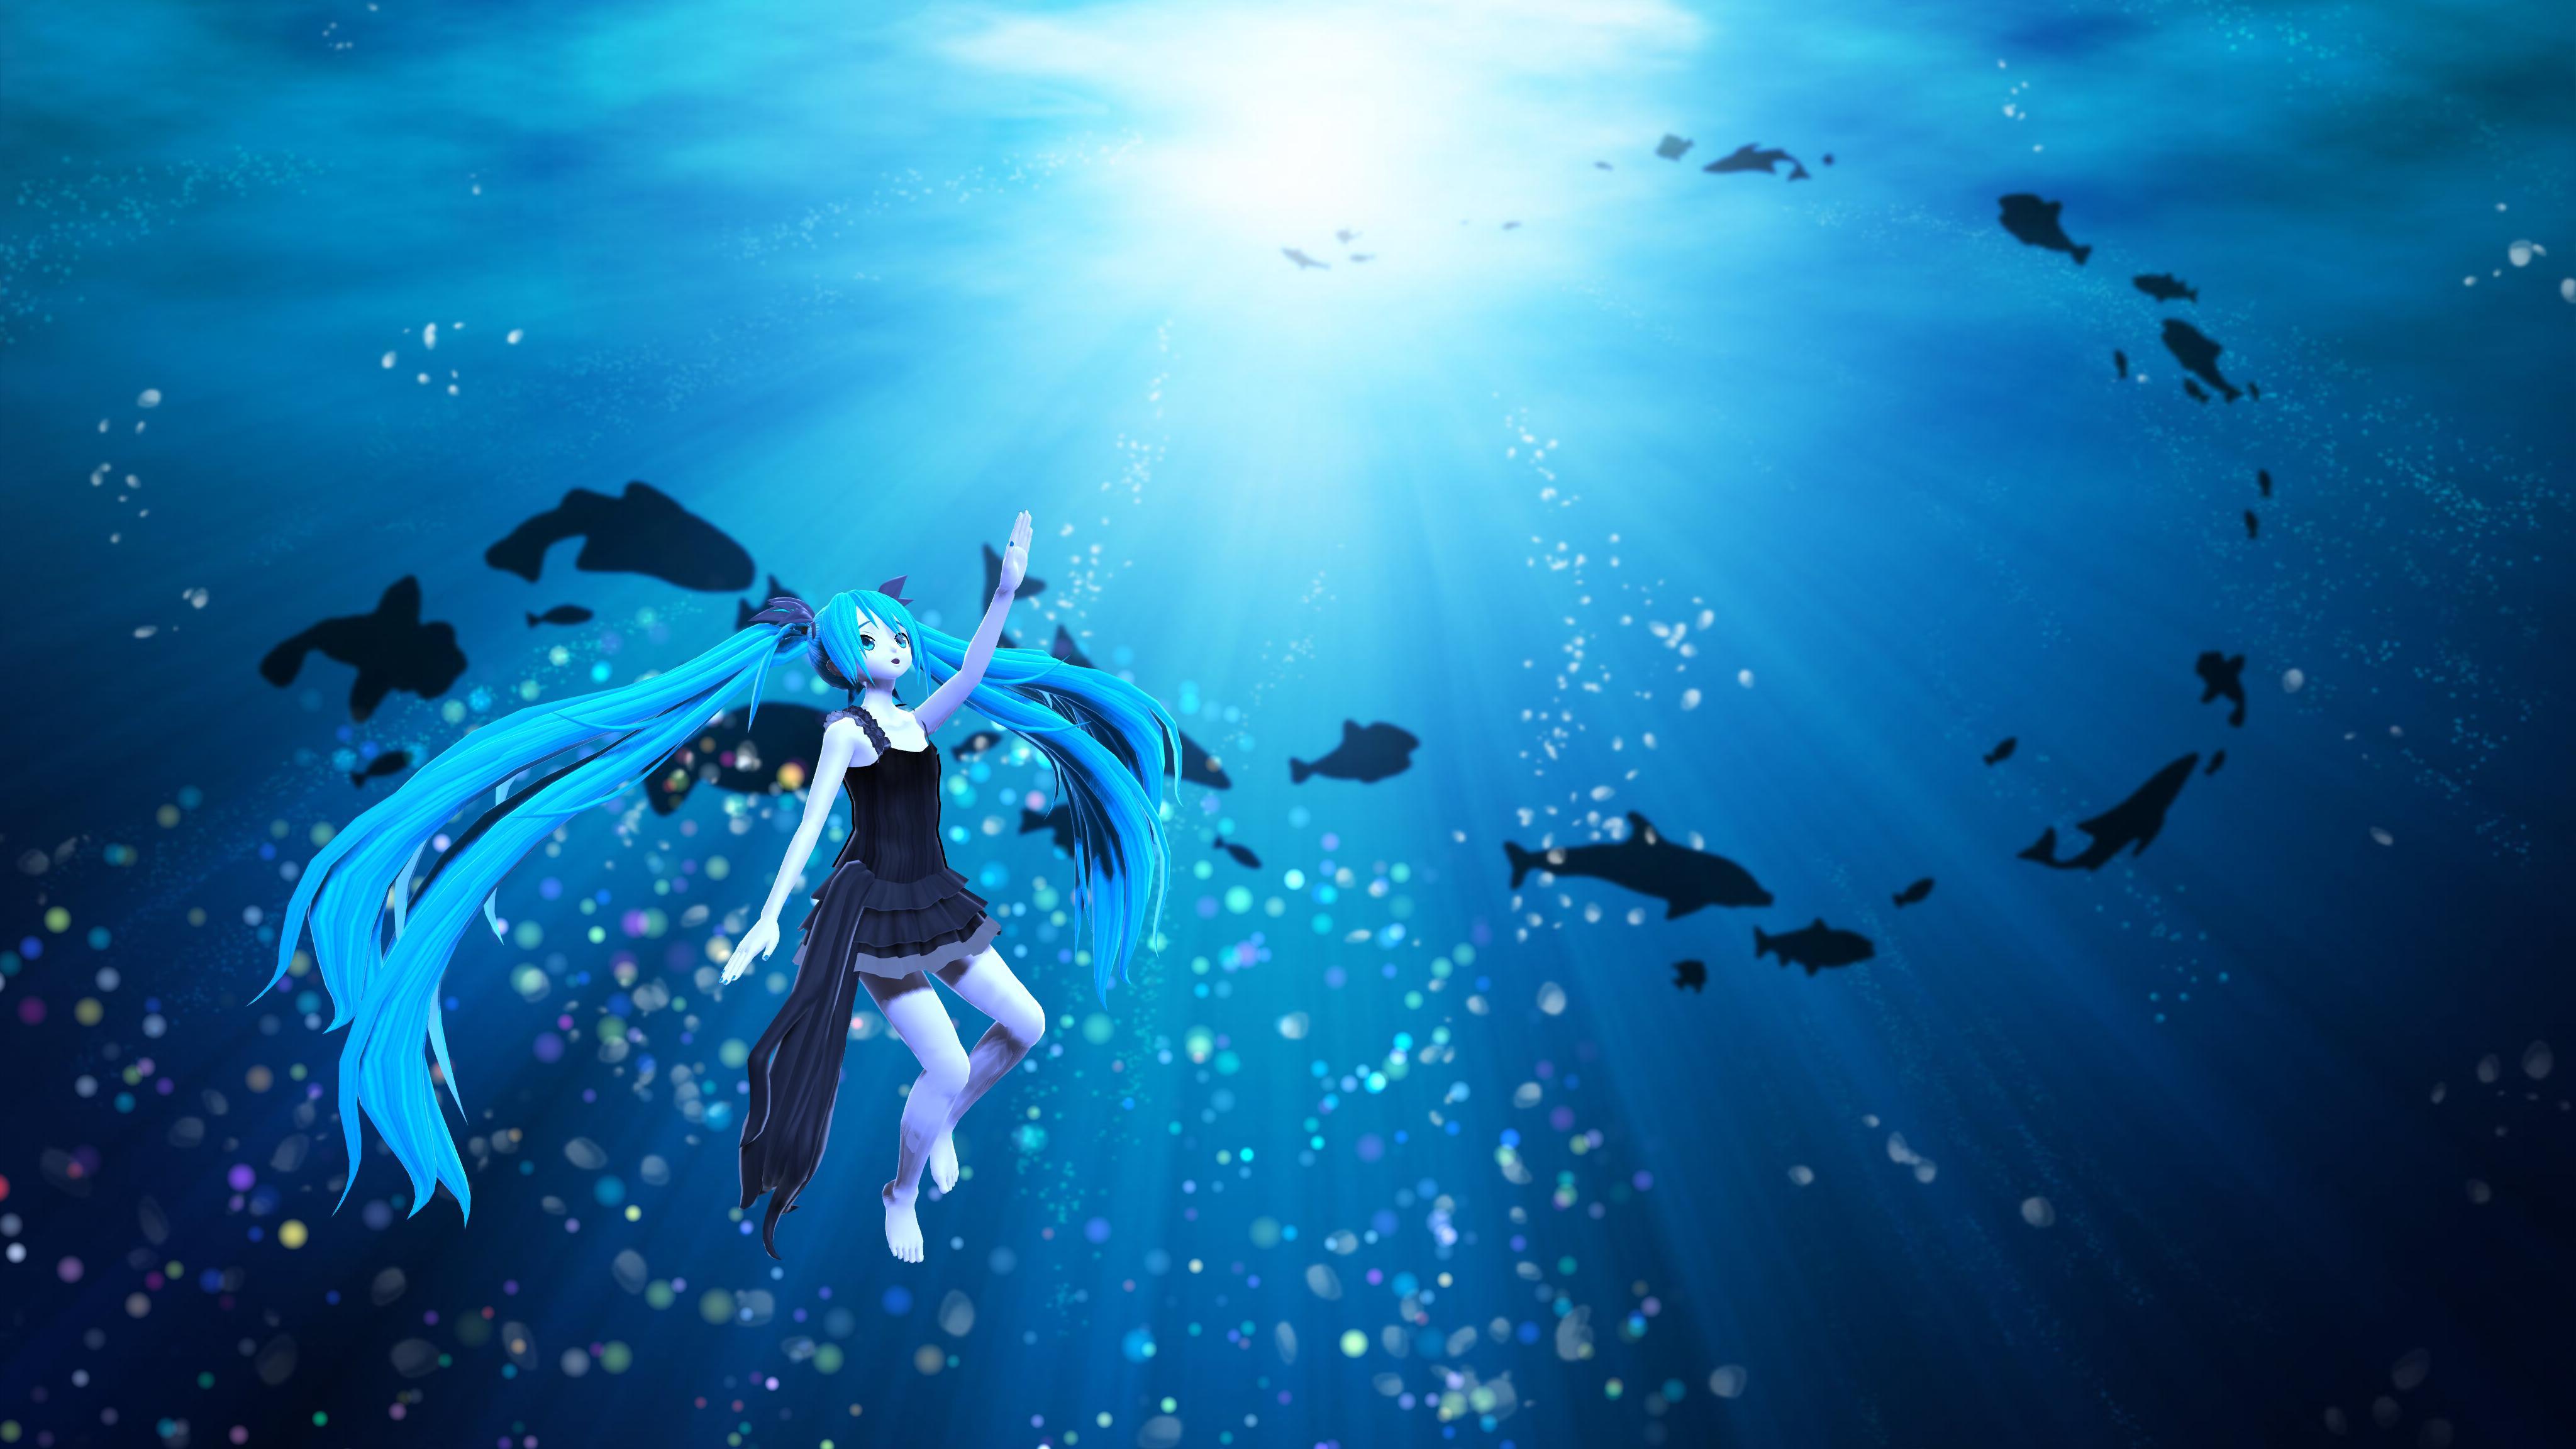 MMD] Deep sea girl   Shinkai shoujo Wallpaper 2 by ManjapanUniverse 4096x2304